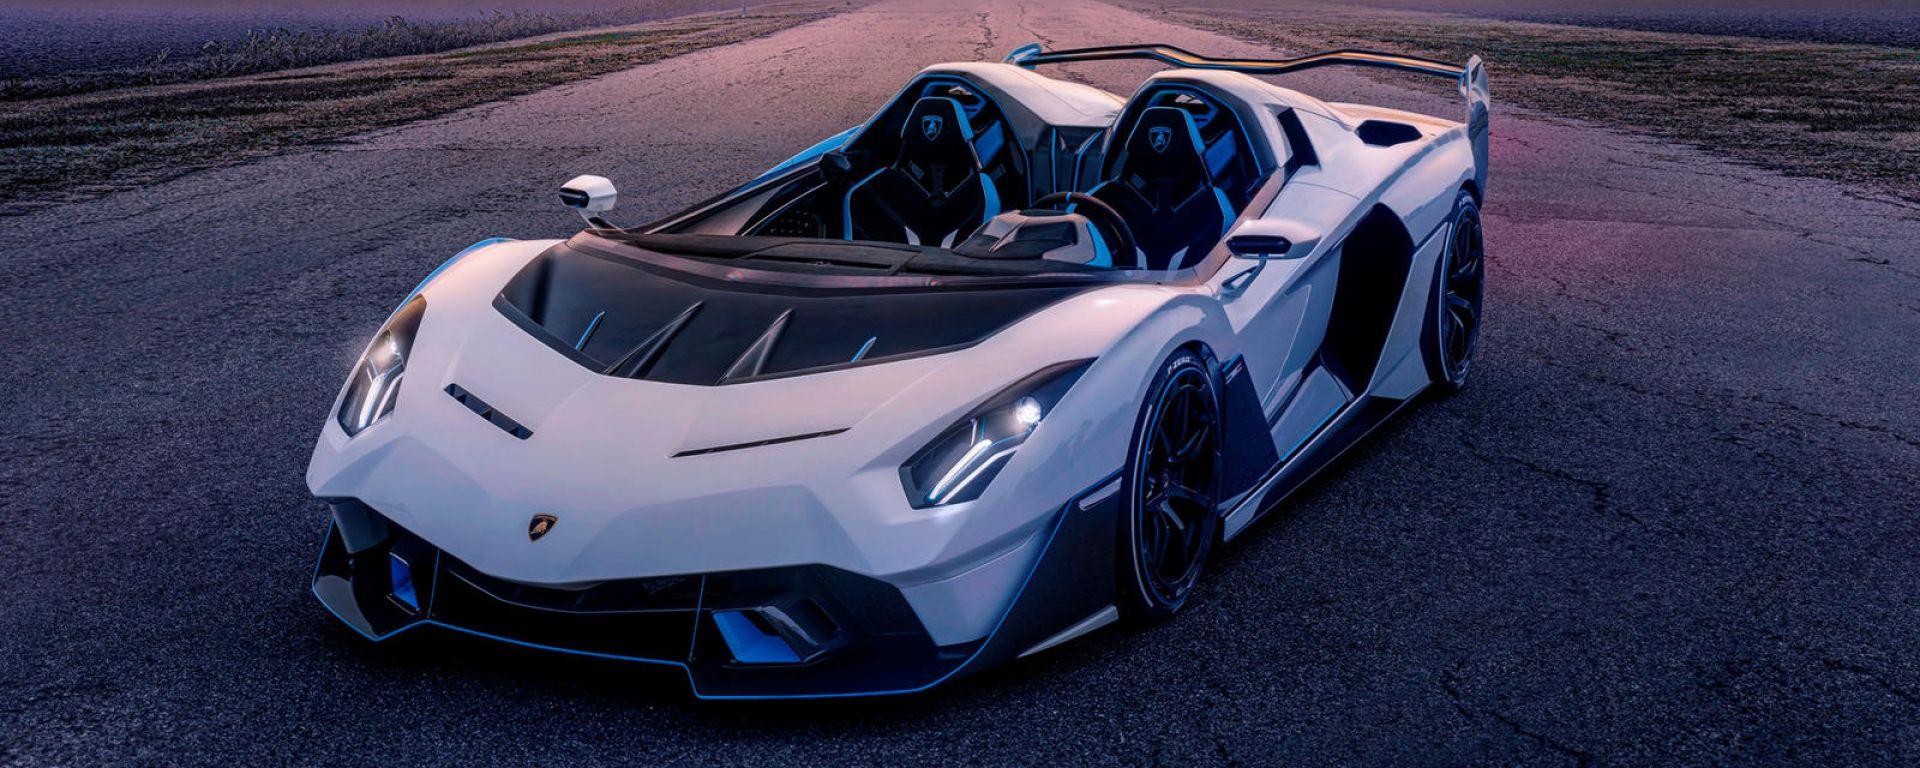 Le hypercar del 2020: Lamborghini SC20